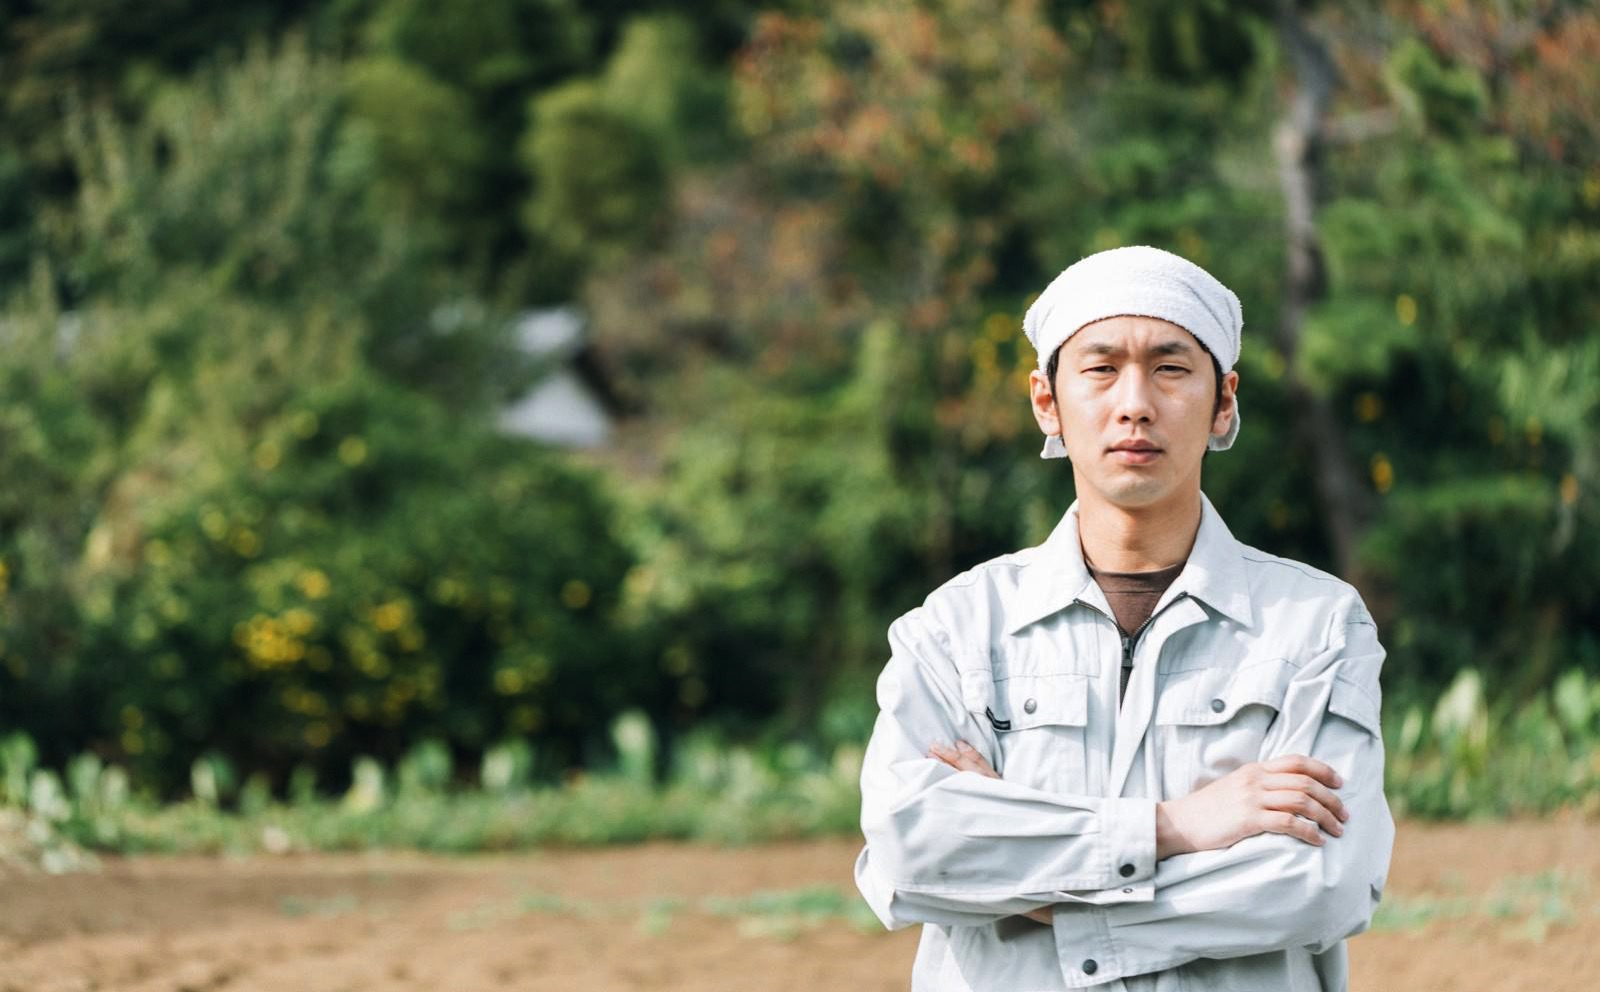 Ookawa151107168050 TP V yami furusatonozei ending